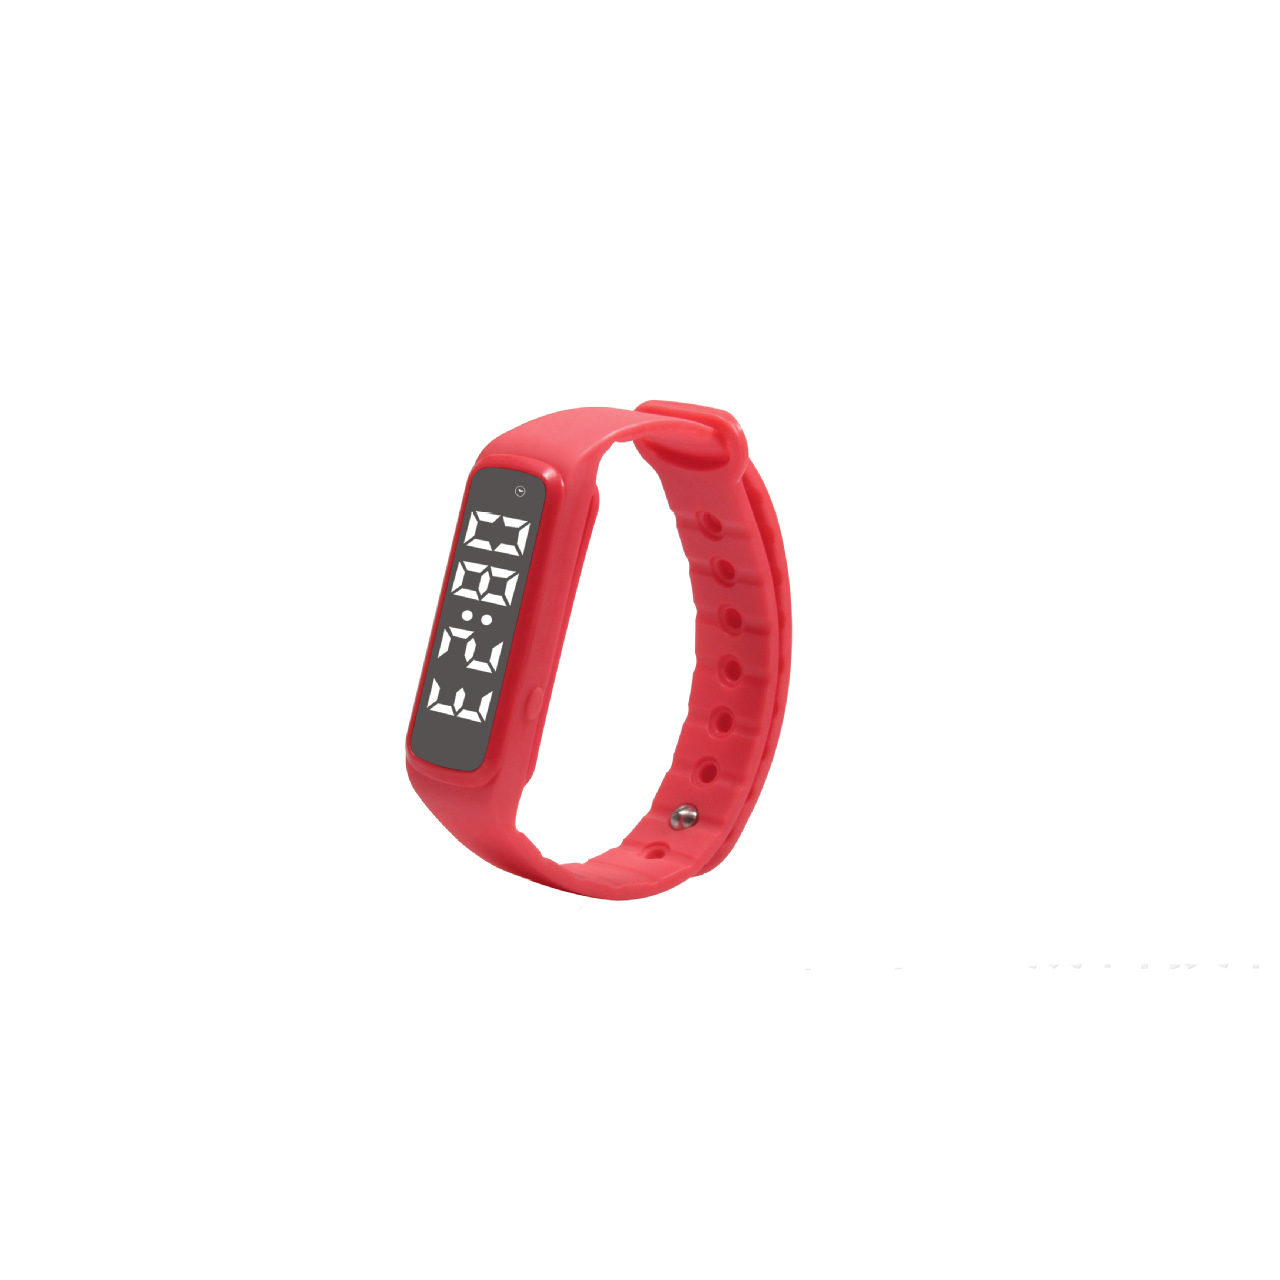 Original Smart Bracelet 24 Hours Step Counter Sleep Monitor Temperature Time Multifunctional Sport Smart Wristbands CD5